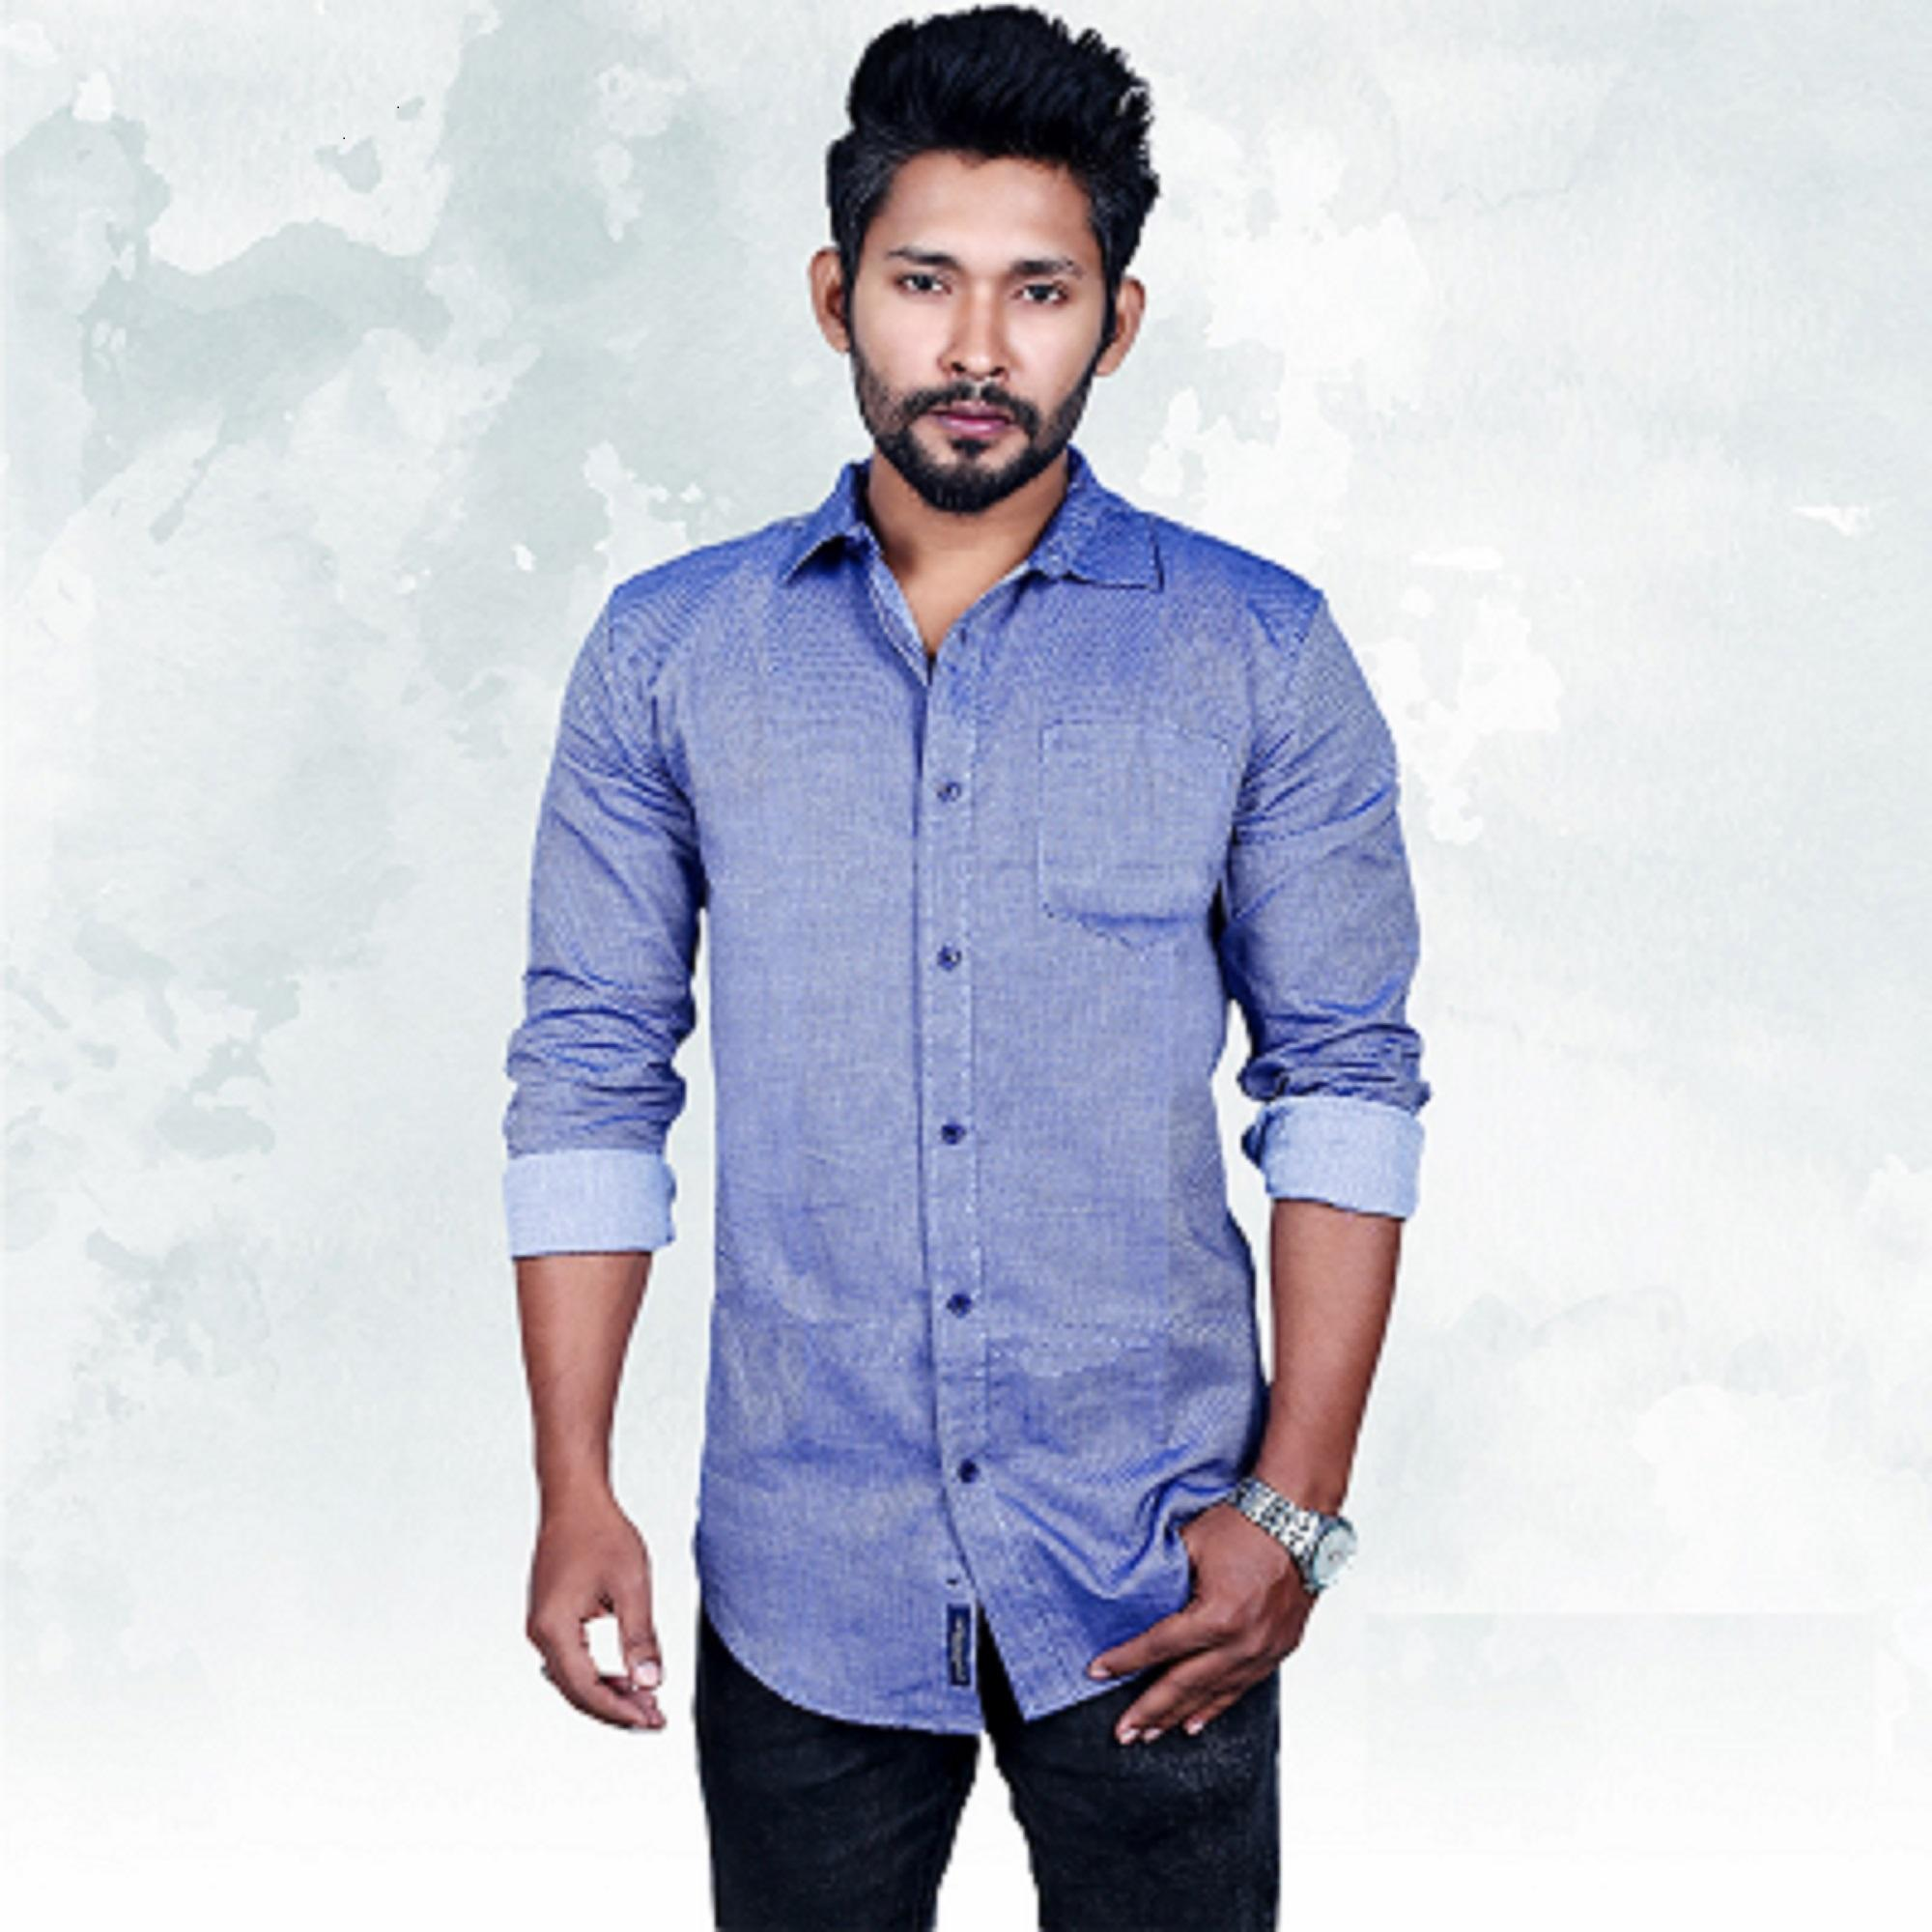 8c25f7cfa4 Shirts For Men - Buy Men s Shirts In Bangladesh Online